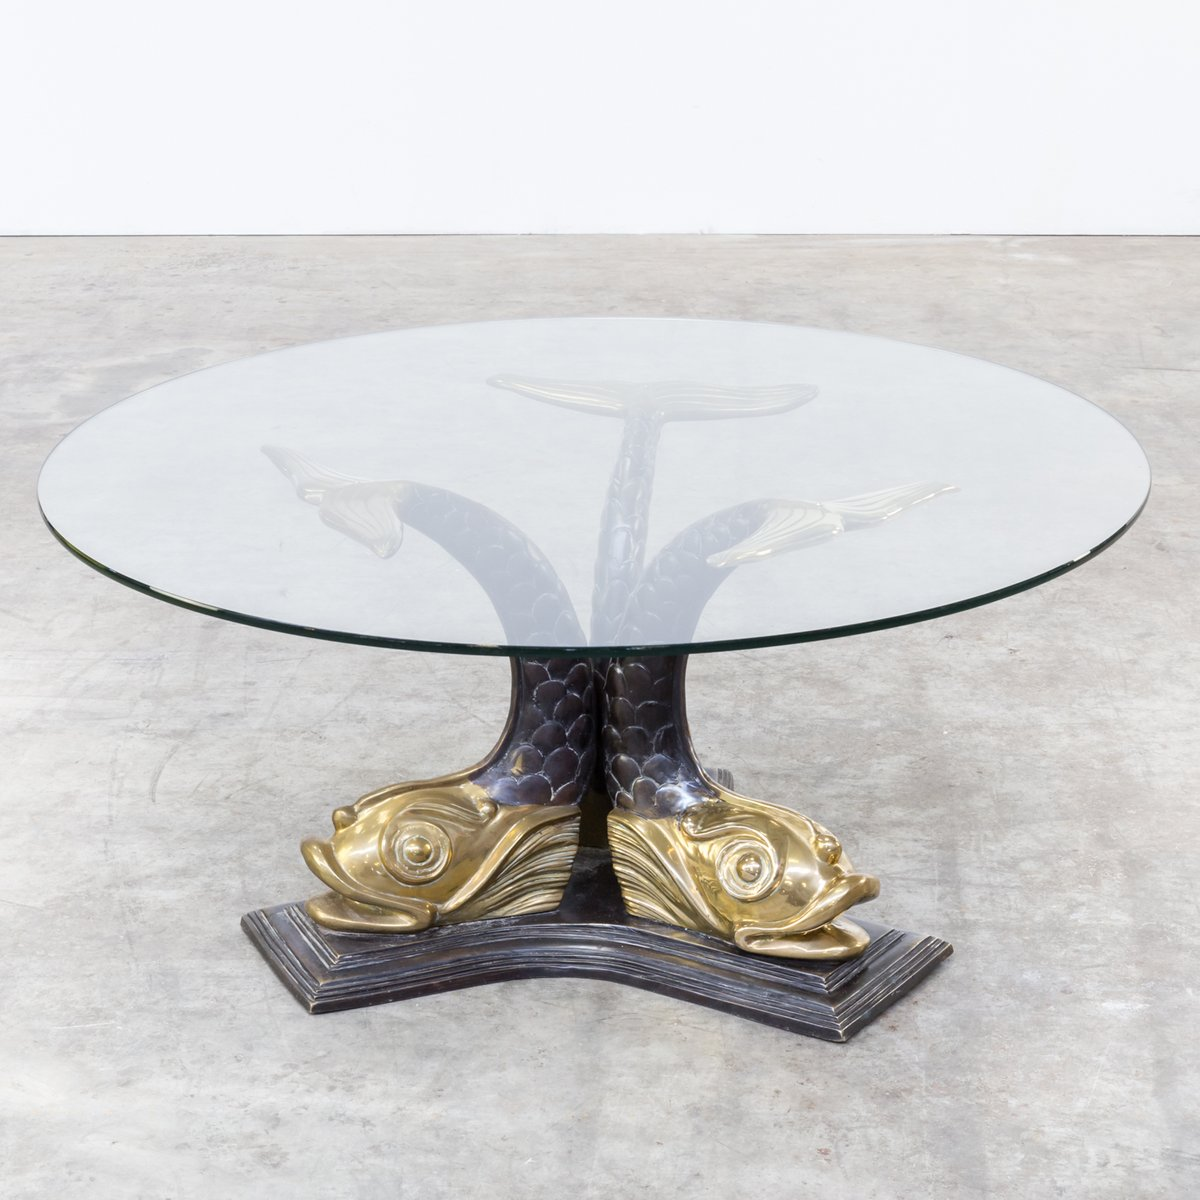 Italian Sculptural Brass Koi Fish Coffee Table, 1960s